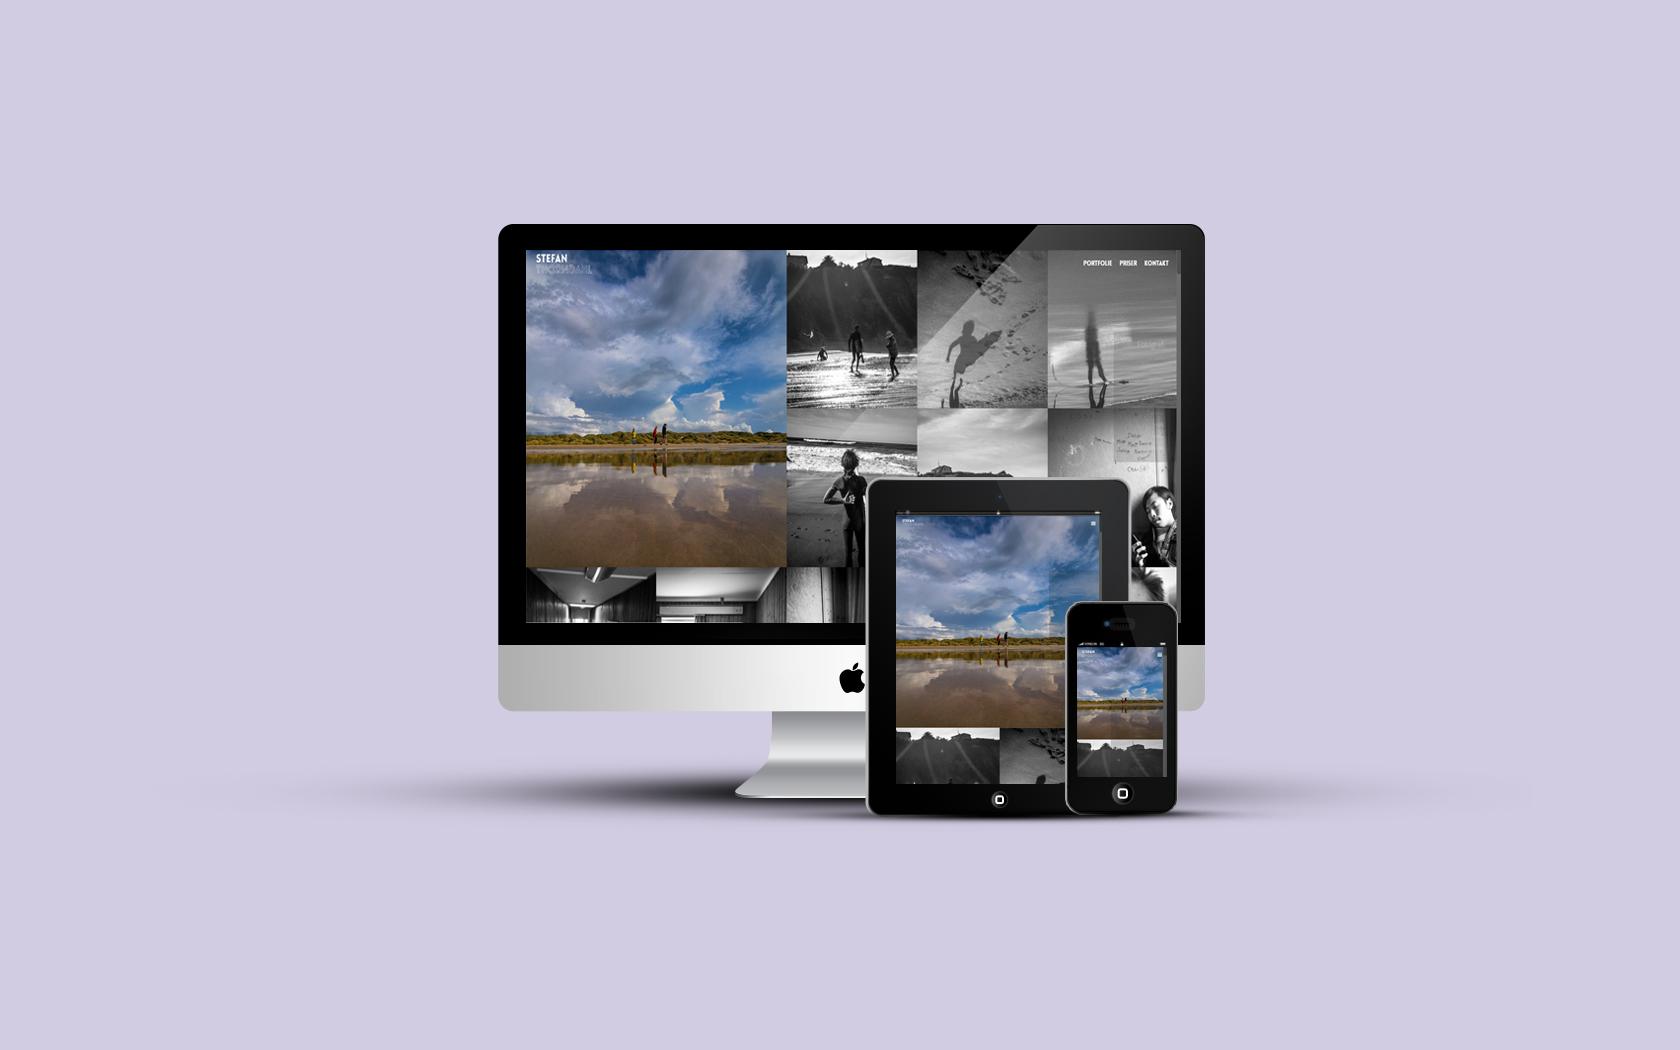 design og multimedier - hjemmeside